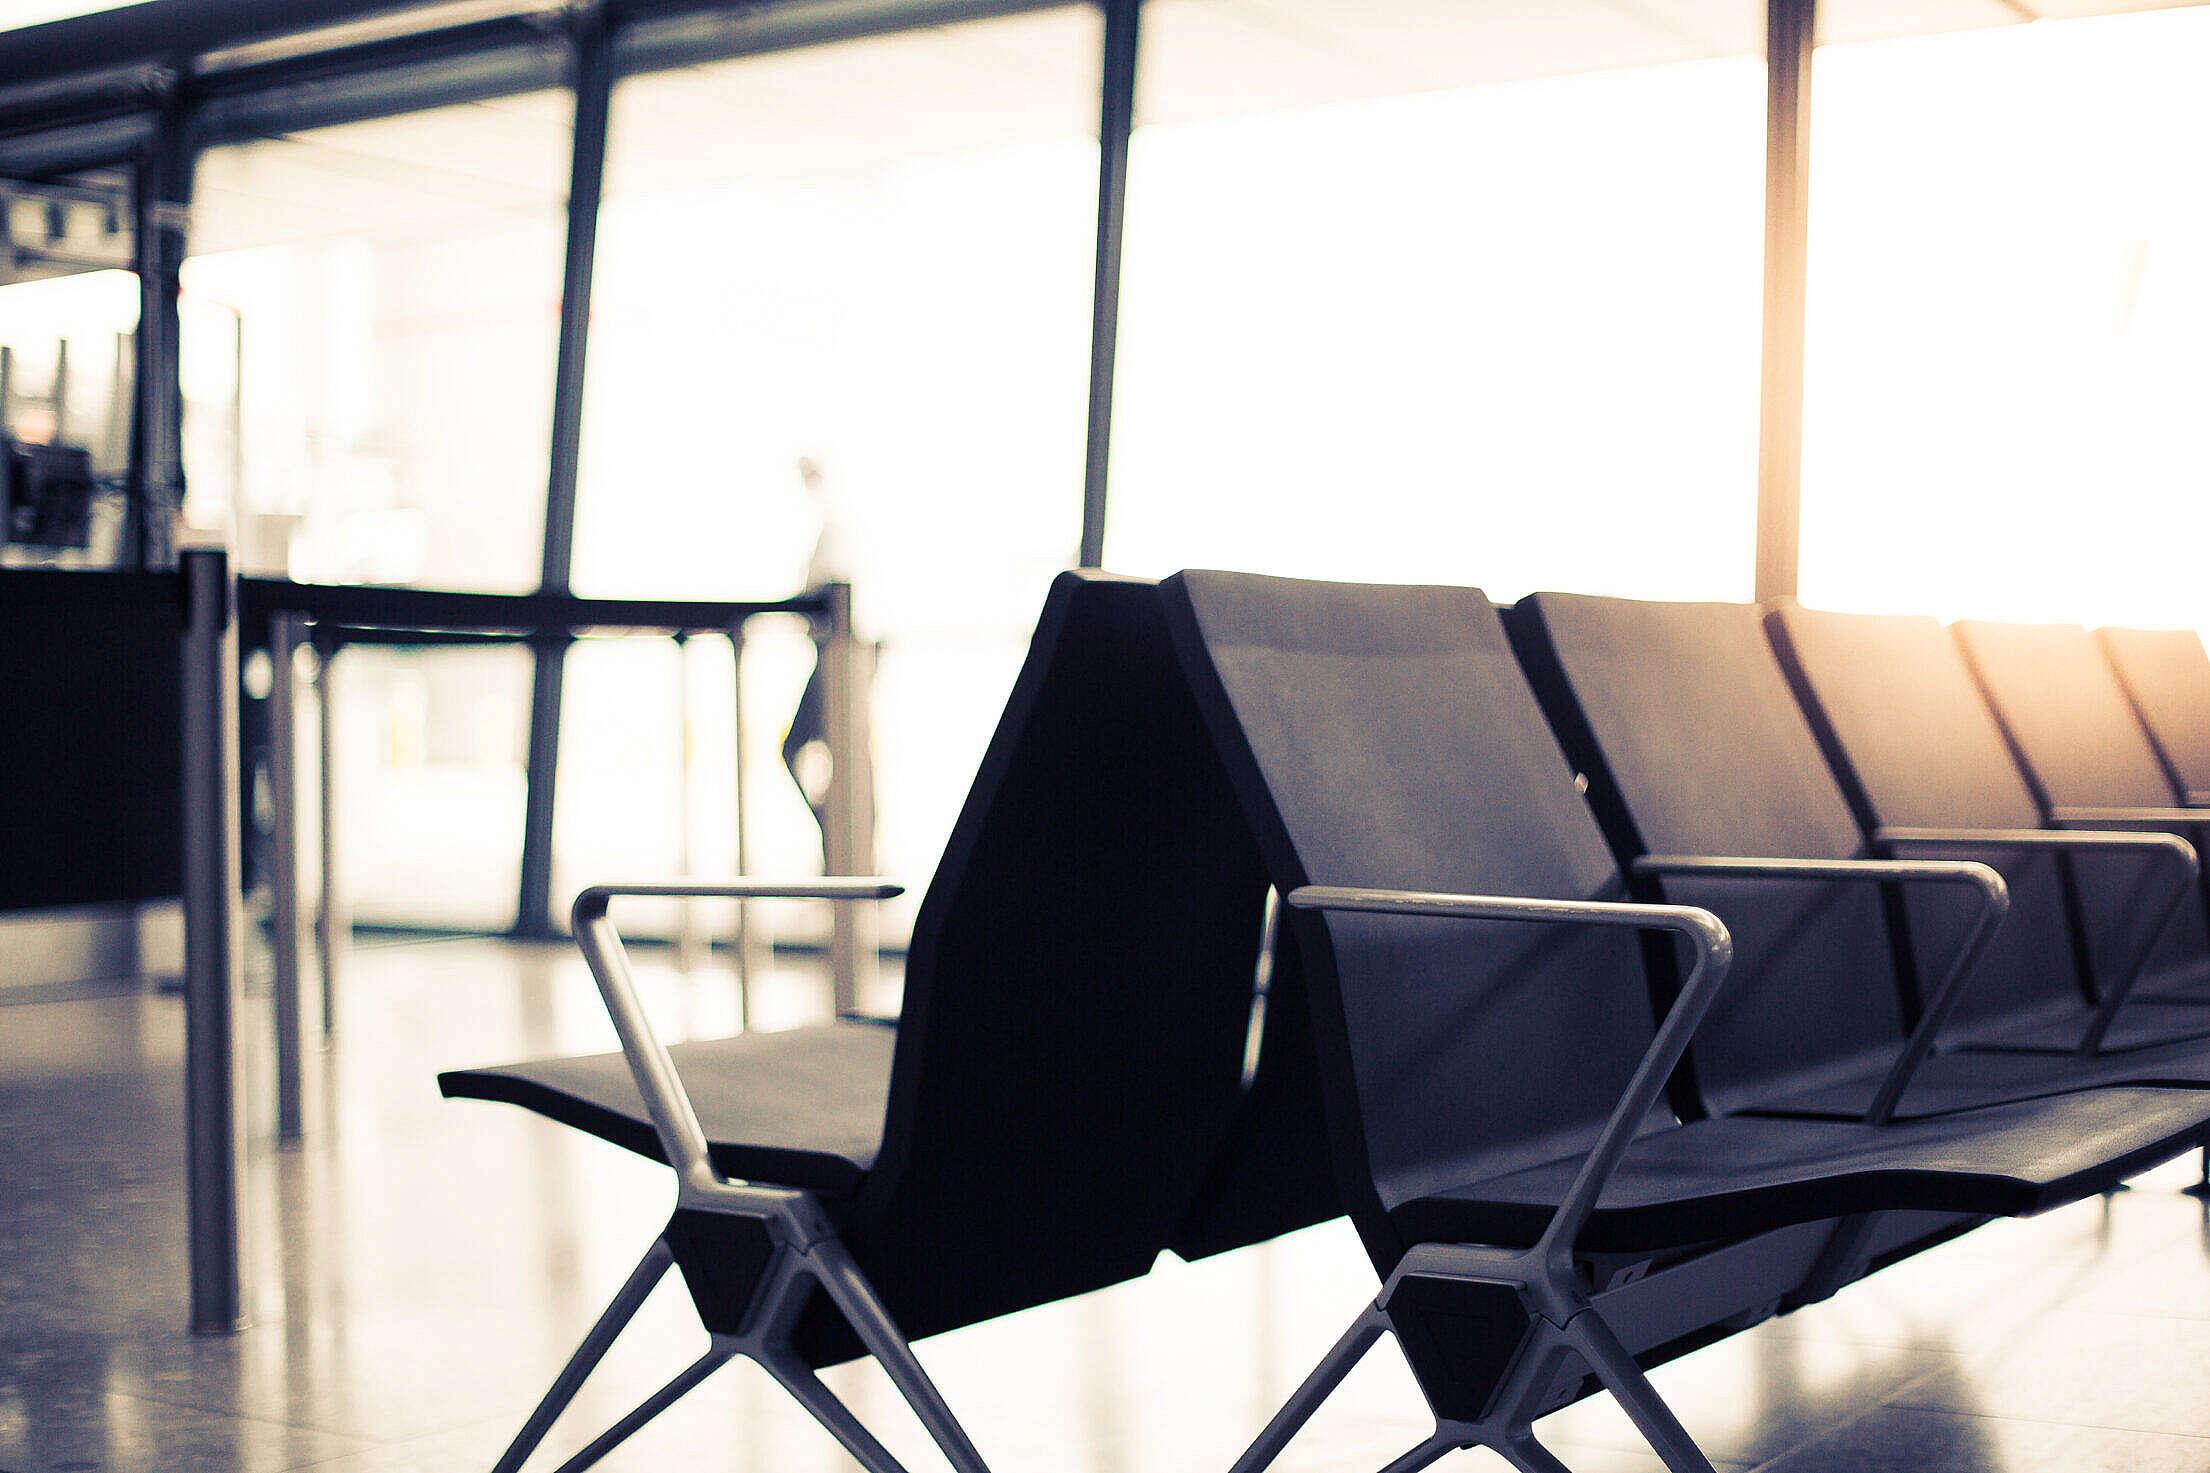 Airport Waiting Lounge Free Stock Photo